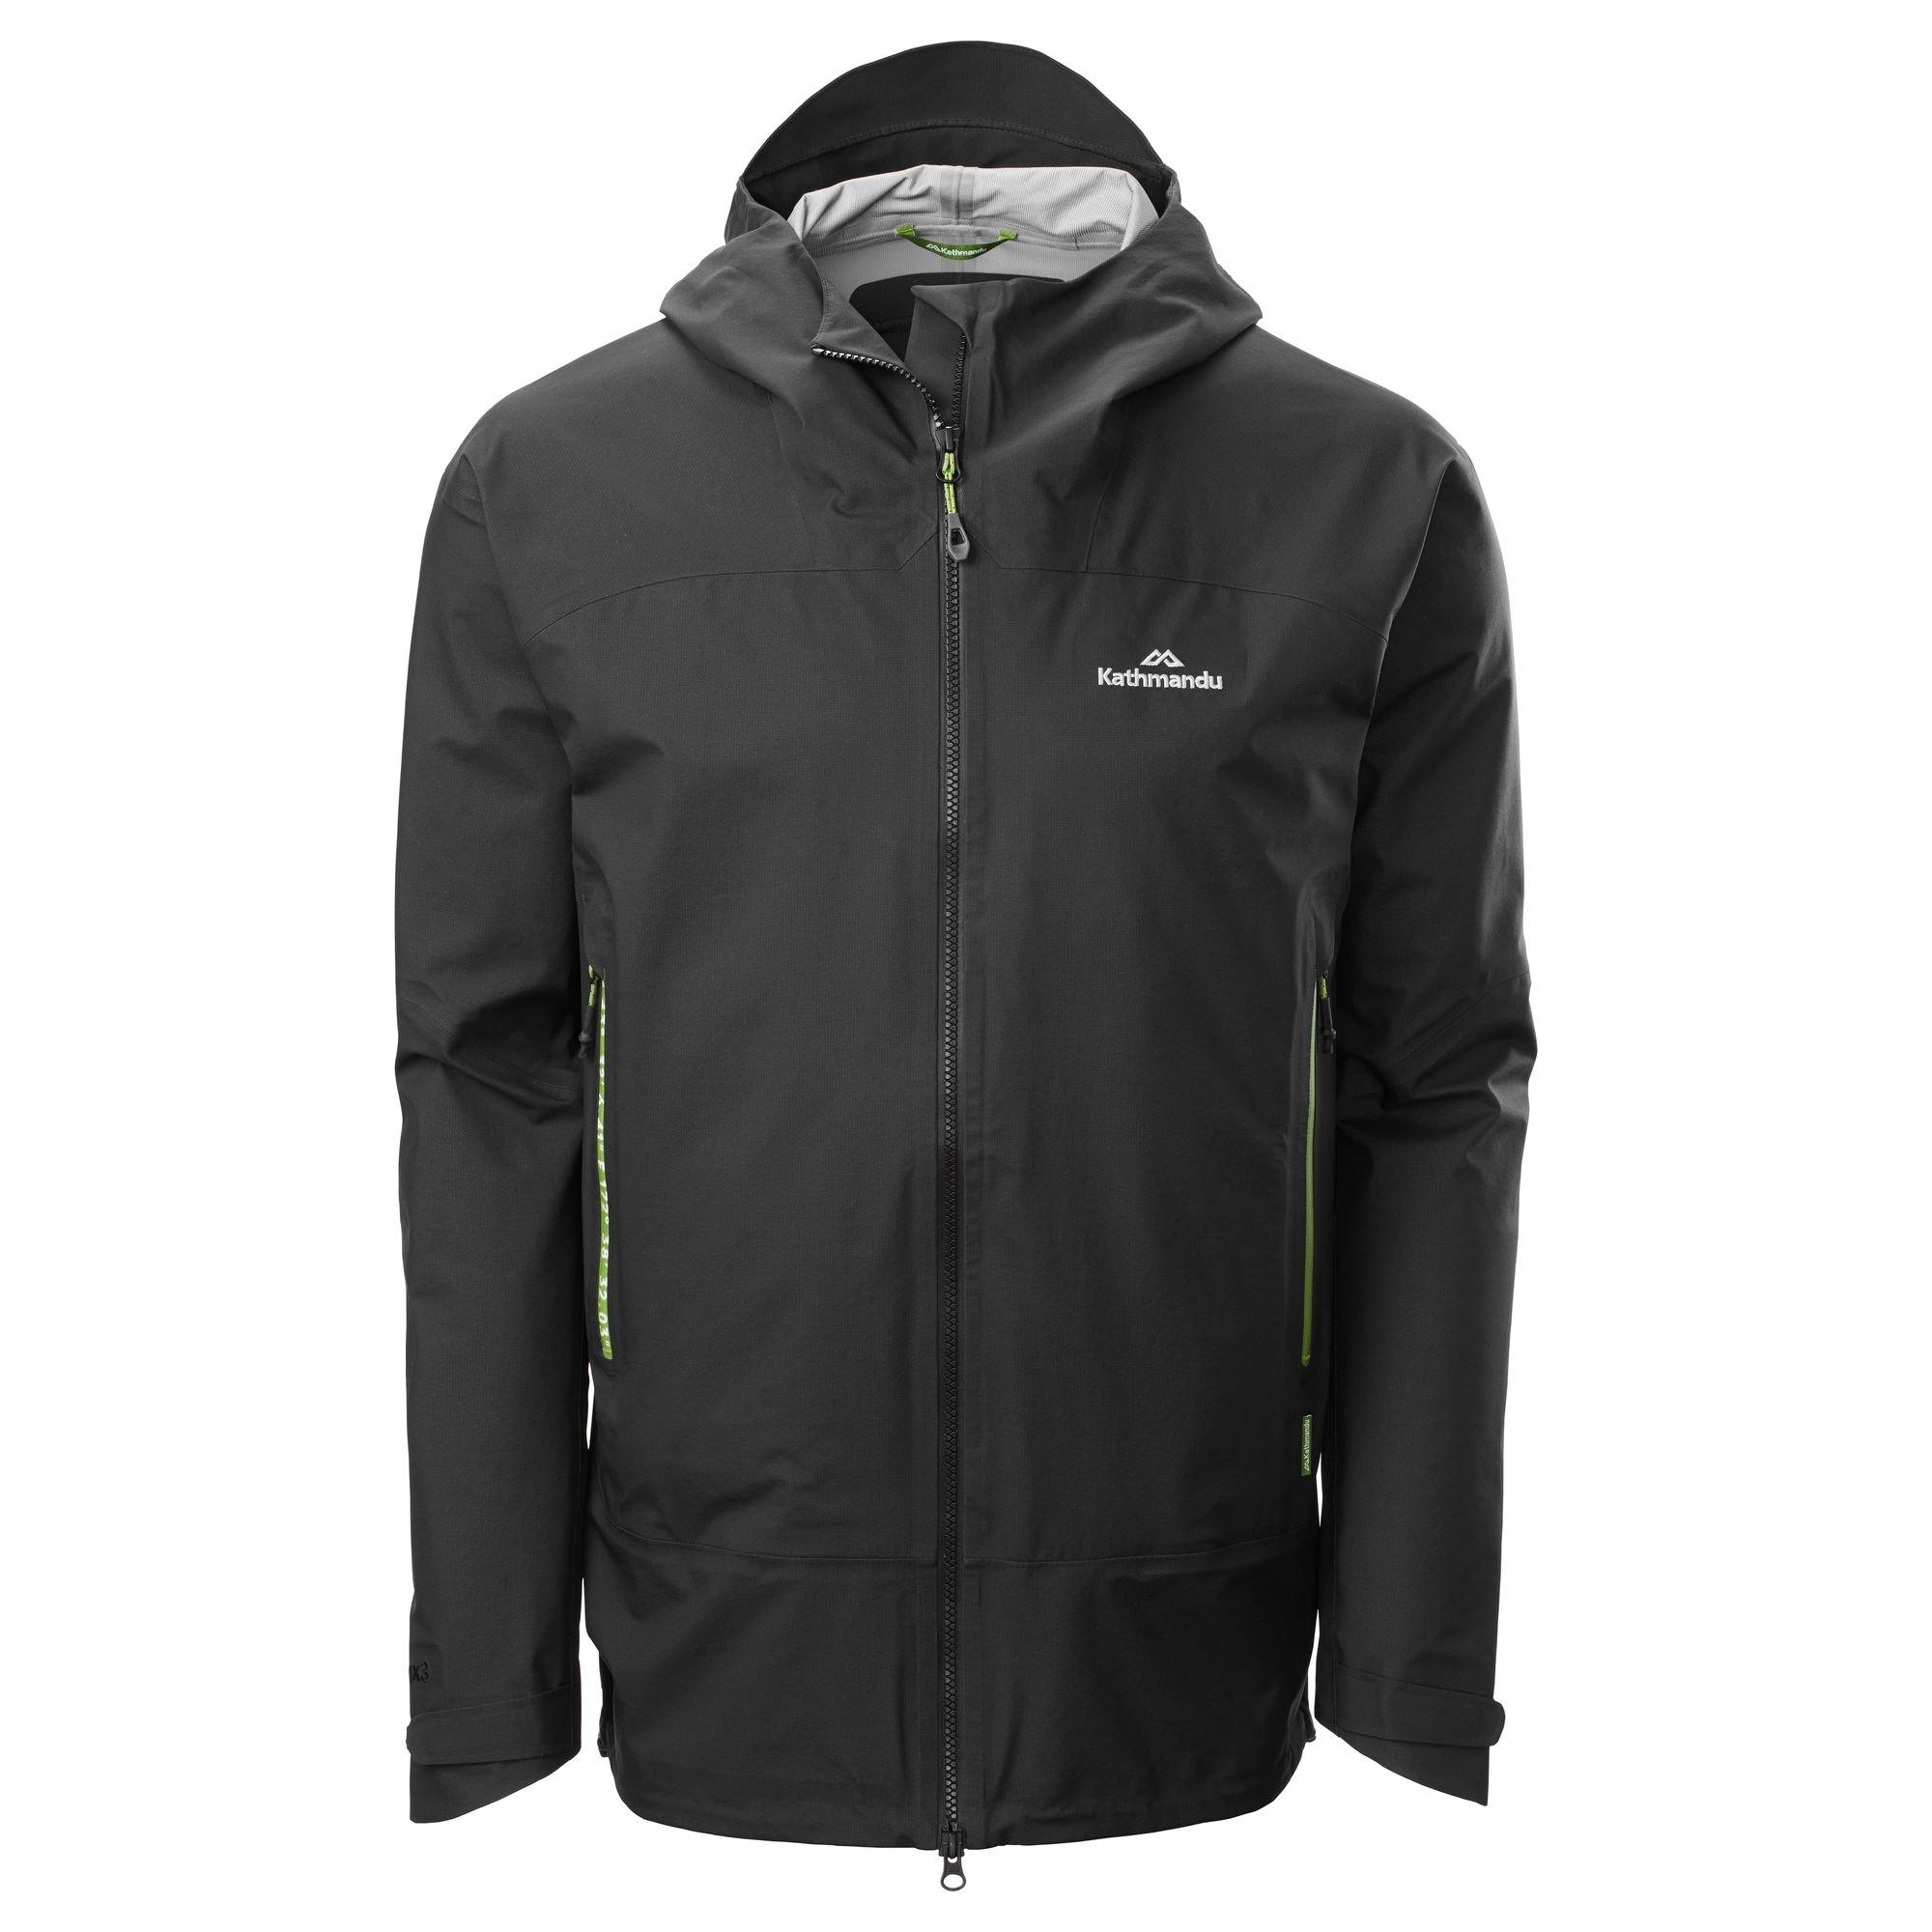 Lightweight Warmth NWT Men/'s Champion Summit Sweater Fleece Jacket